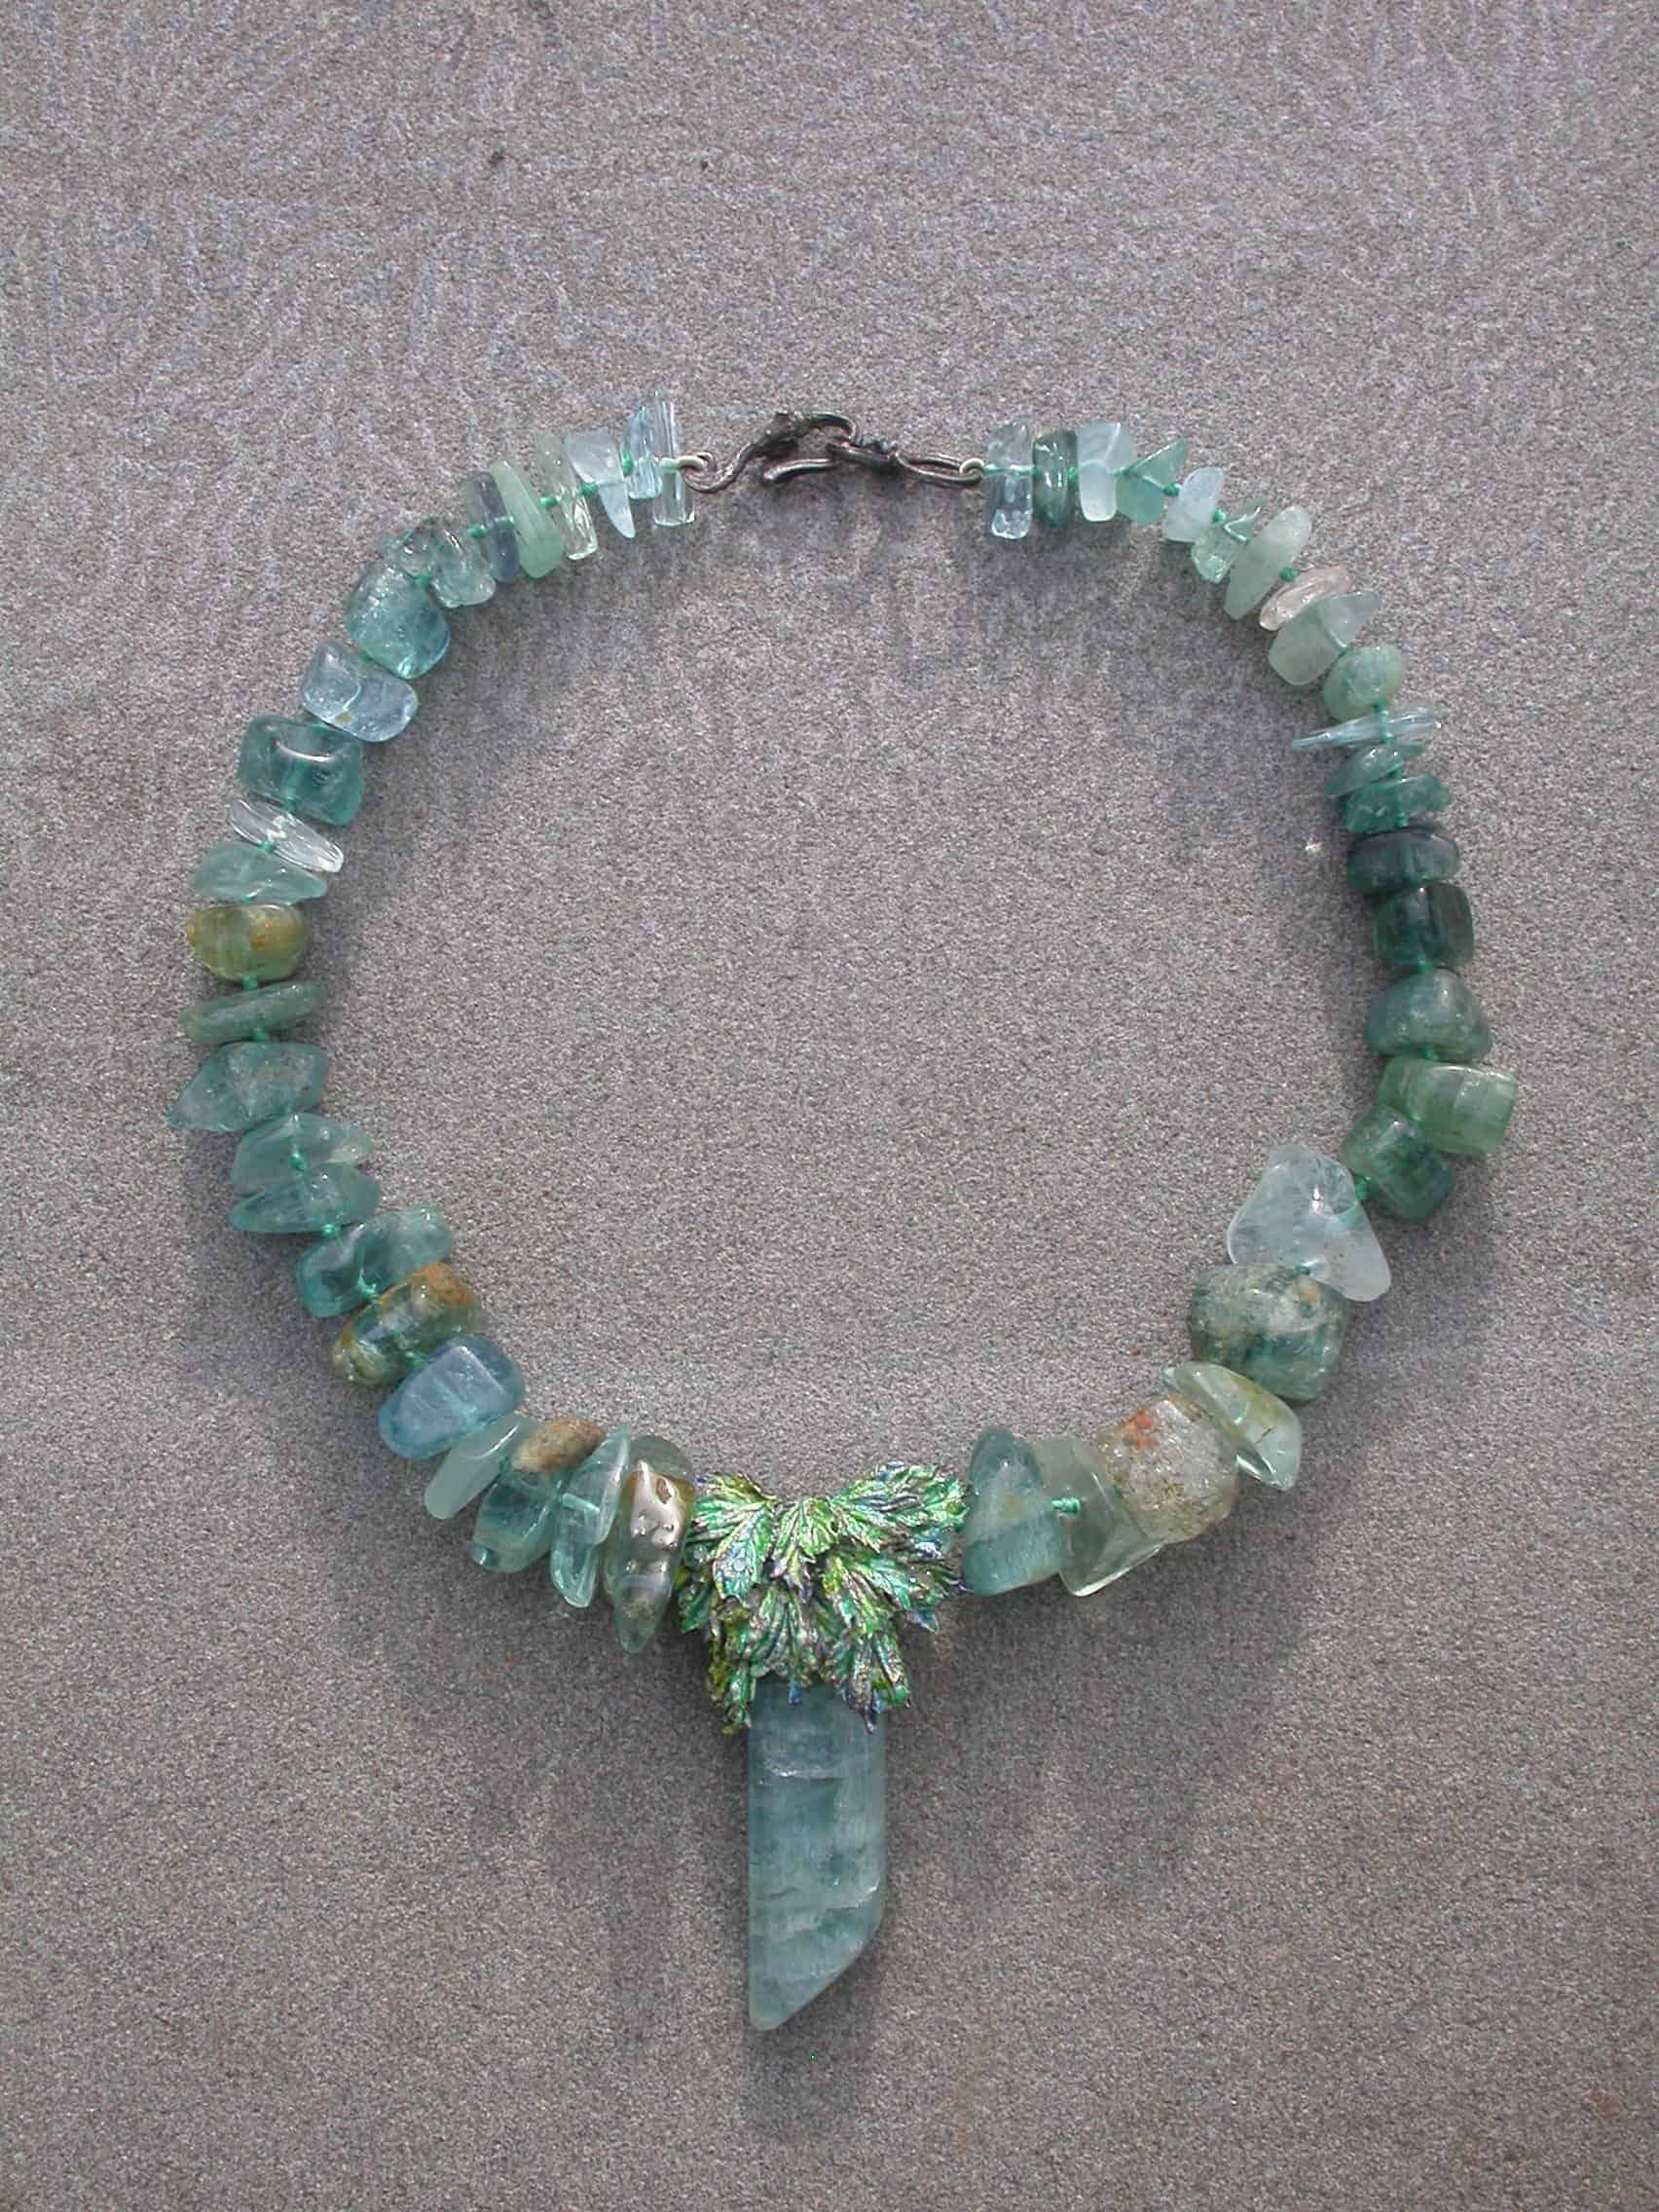 Unique necklaces, aquamarine, sterling silver, enamelled 2